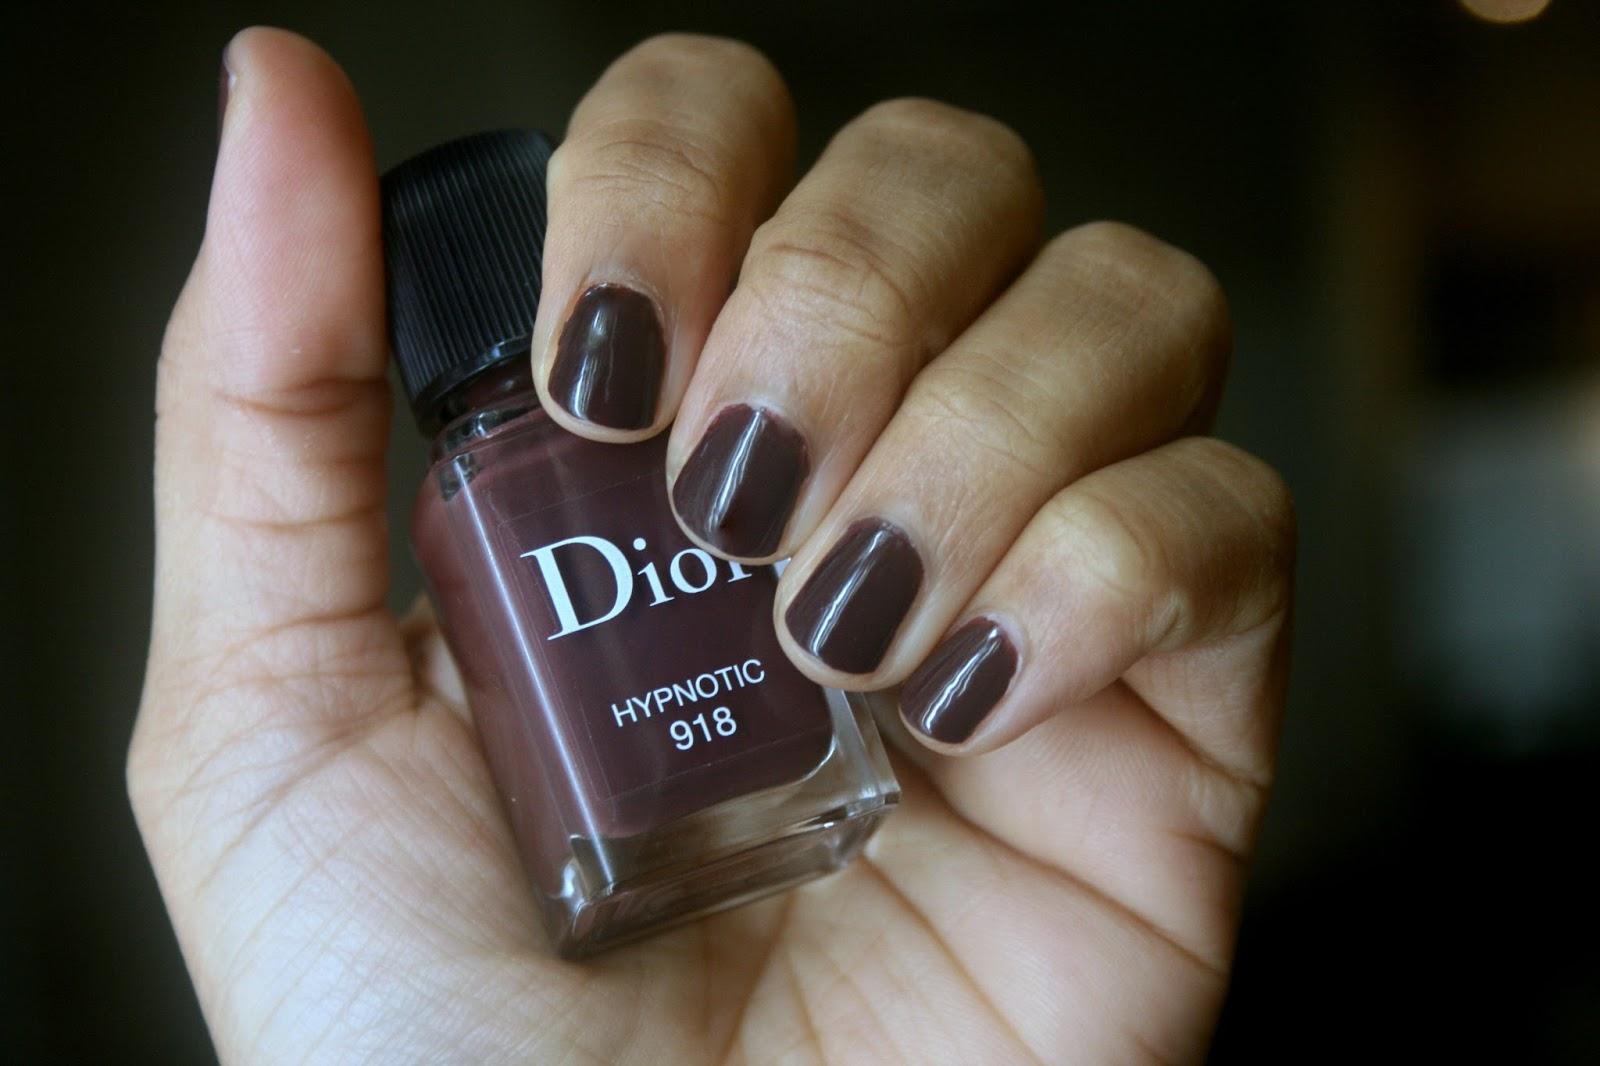 Dior Vernis Hypnotic #918 Swatch